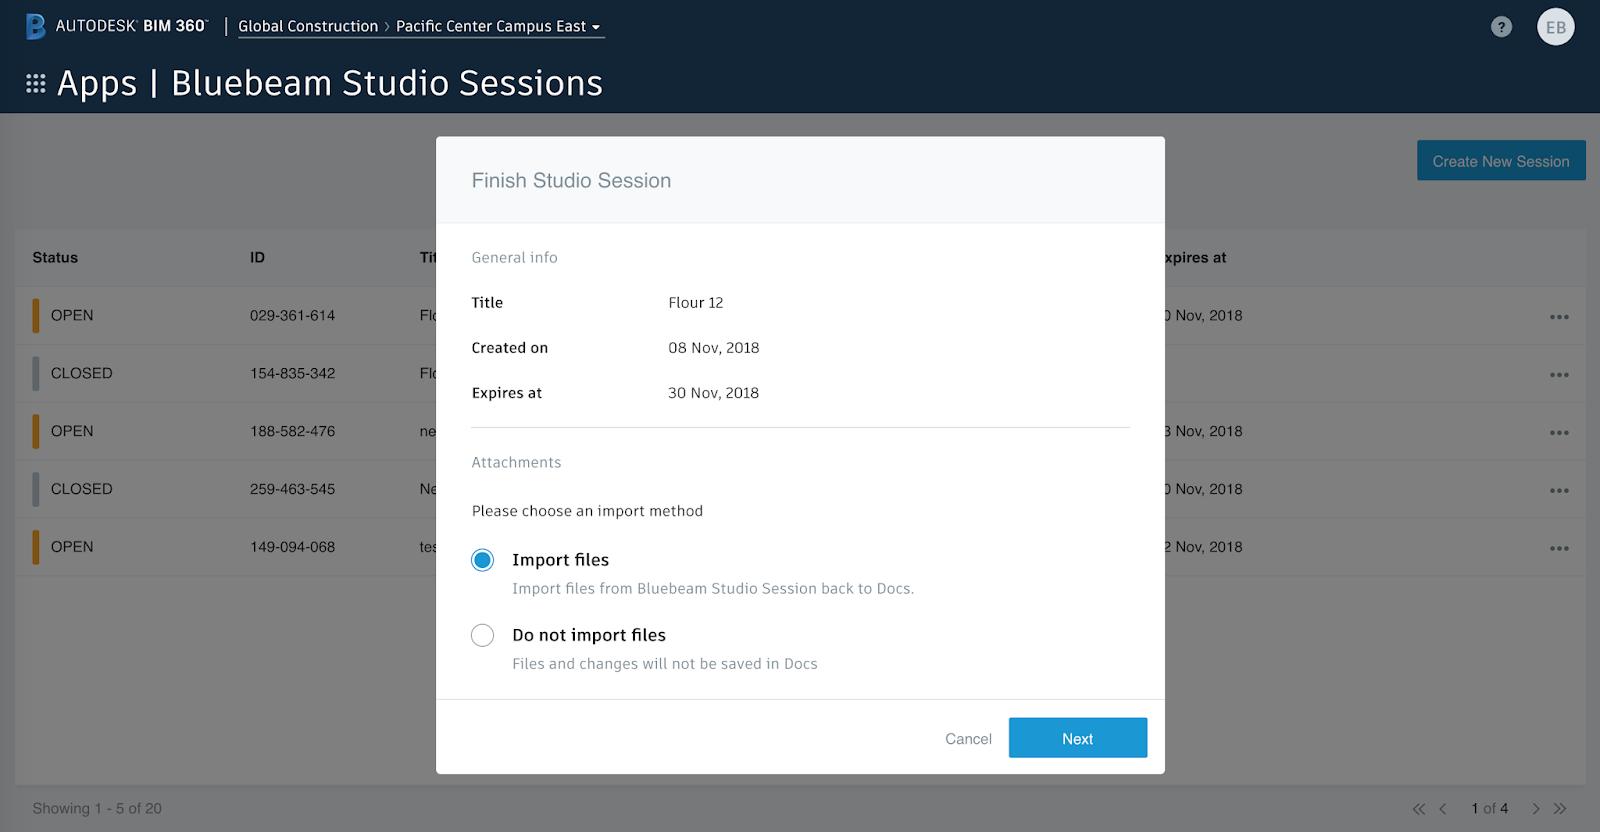 Revit Add-Ons: Bluebeam Studio Sessions for BIM 360